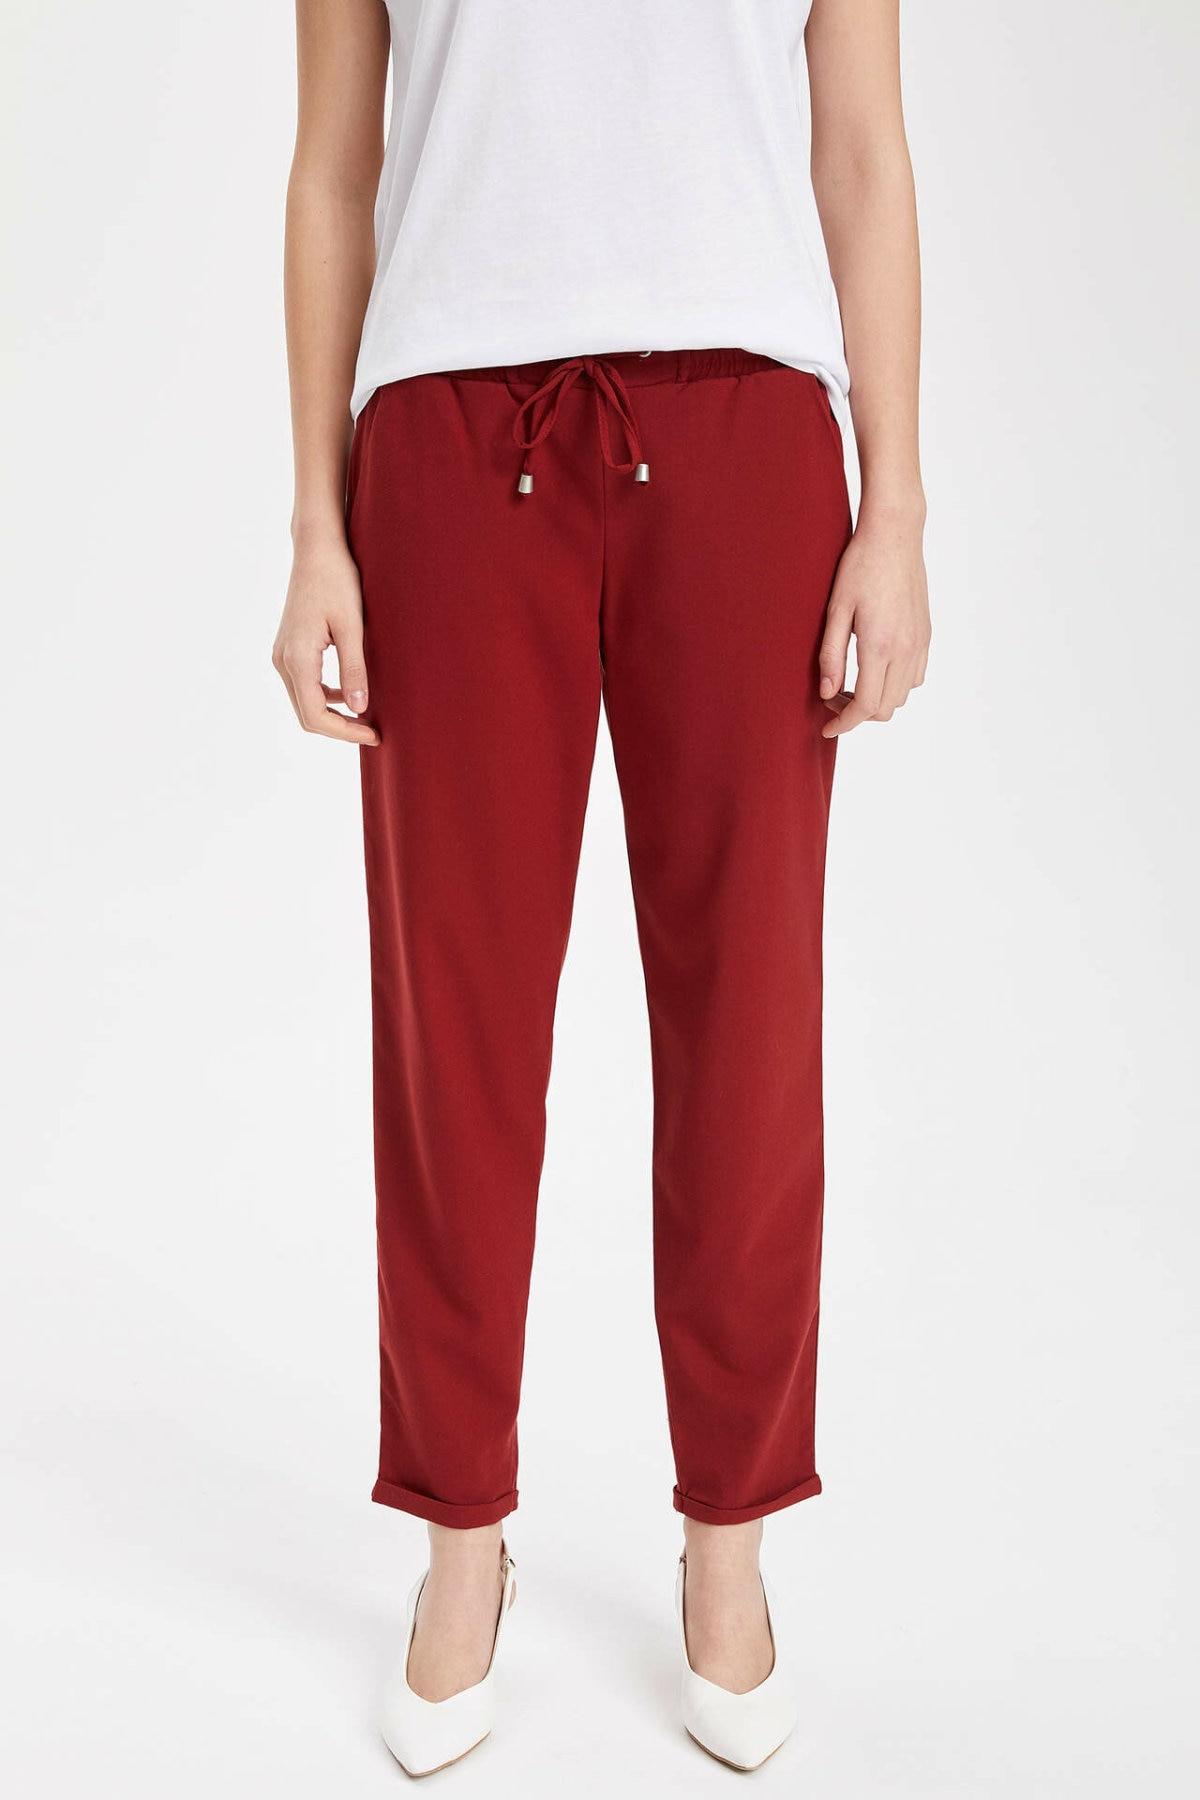 DeFacto Woman Fashion Sport Trousers Female Casual Drawstring Loose Pants Ladies Comfort Loose Sweatpants New - I4363AZ19SP